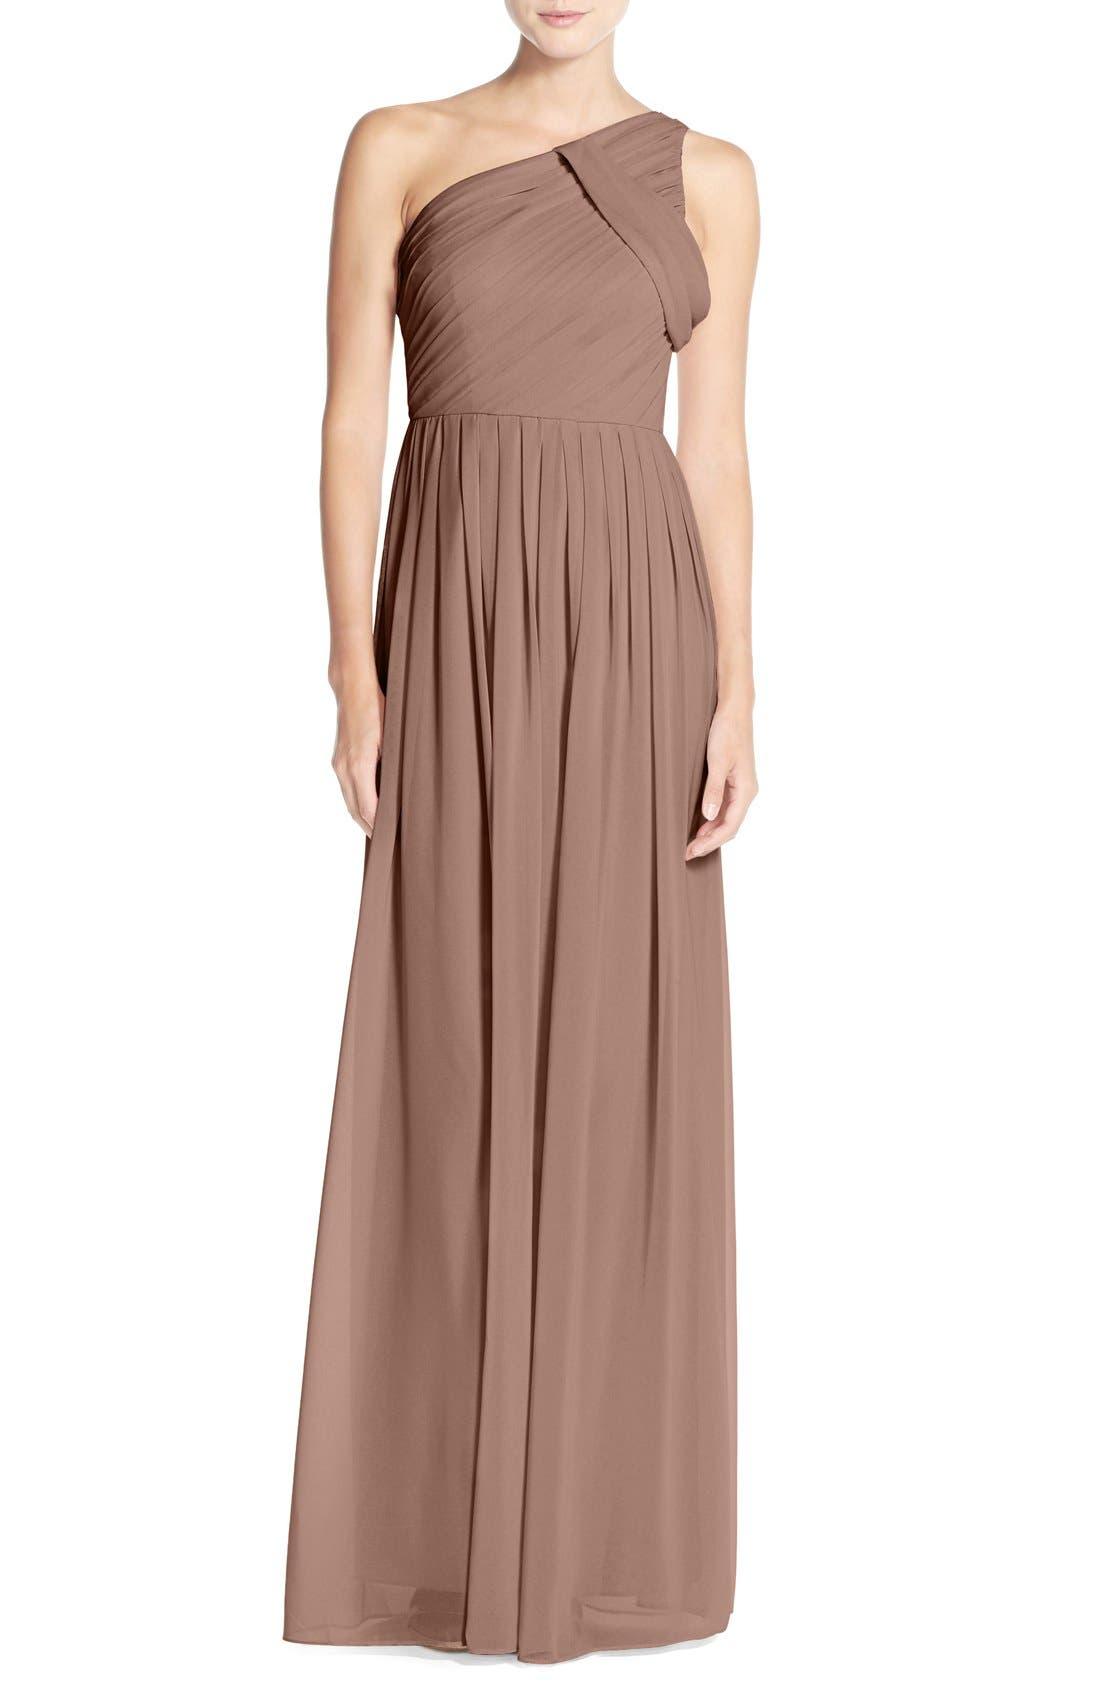 'Chloe' One-Shoulder Pleat Chiffon Gown,                         Main,                         color, Hibiscus Tea